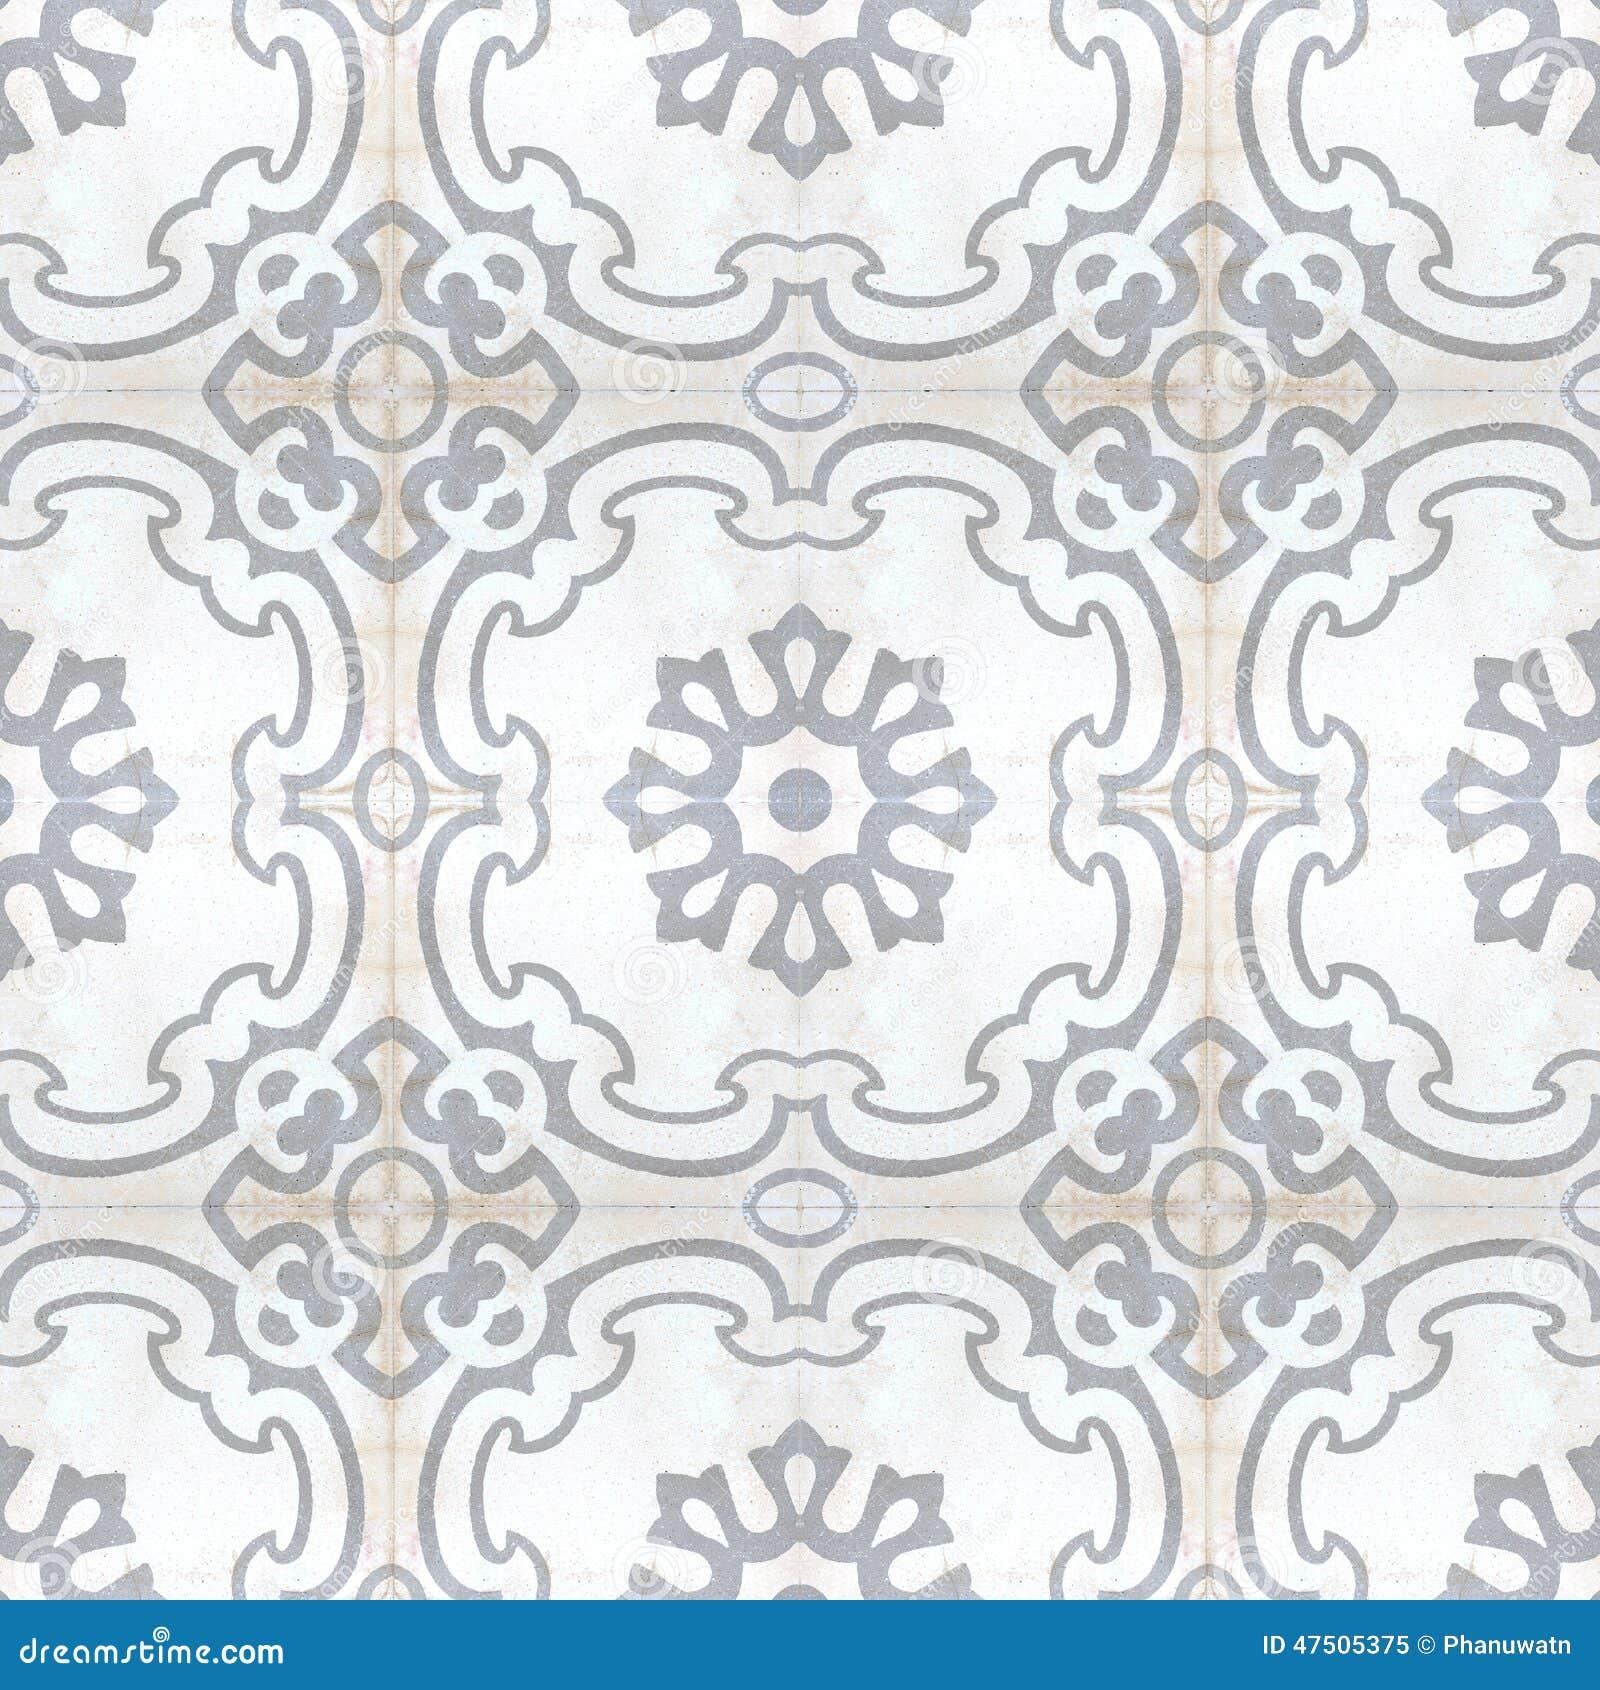 Vintage Style Floor Tile Pattern Texture Stock Image